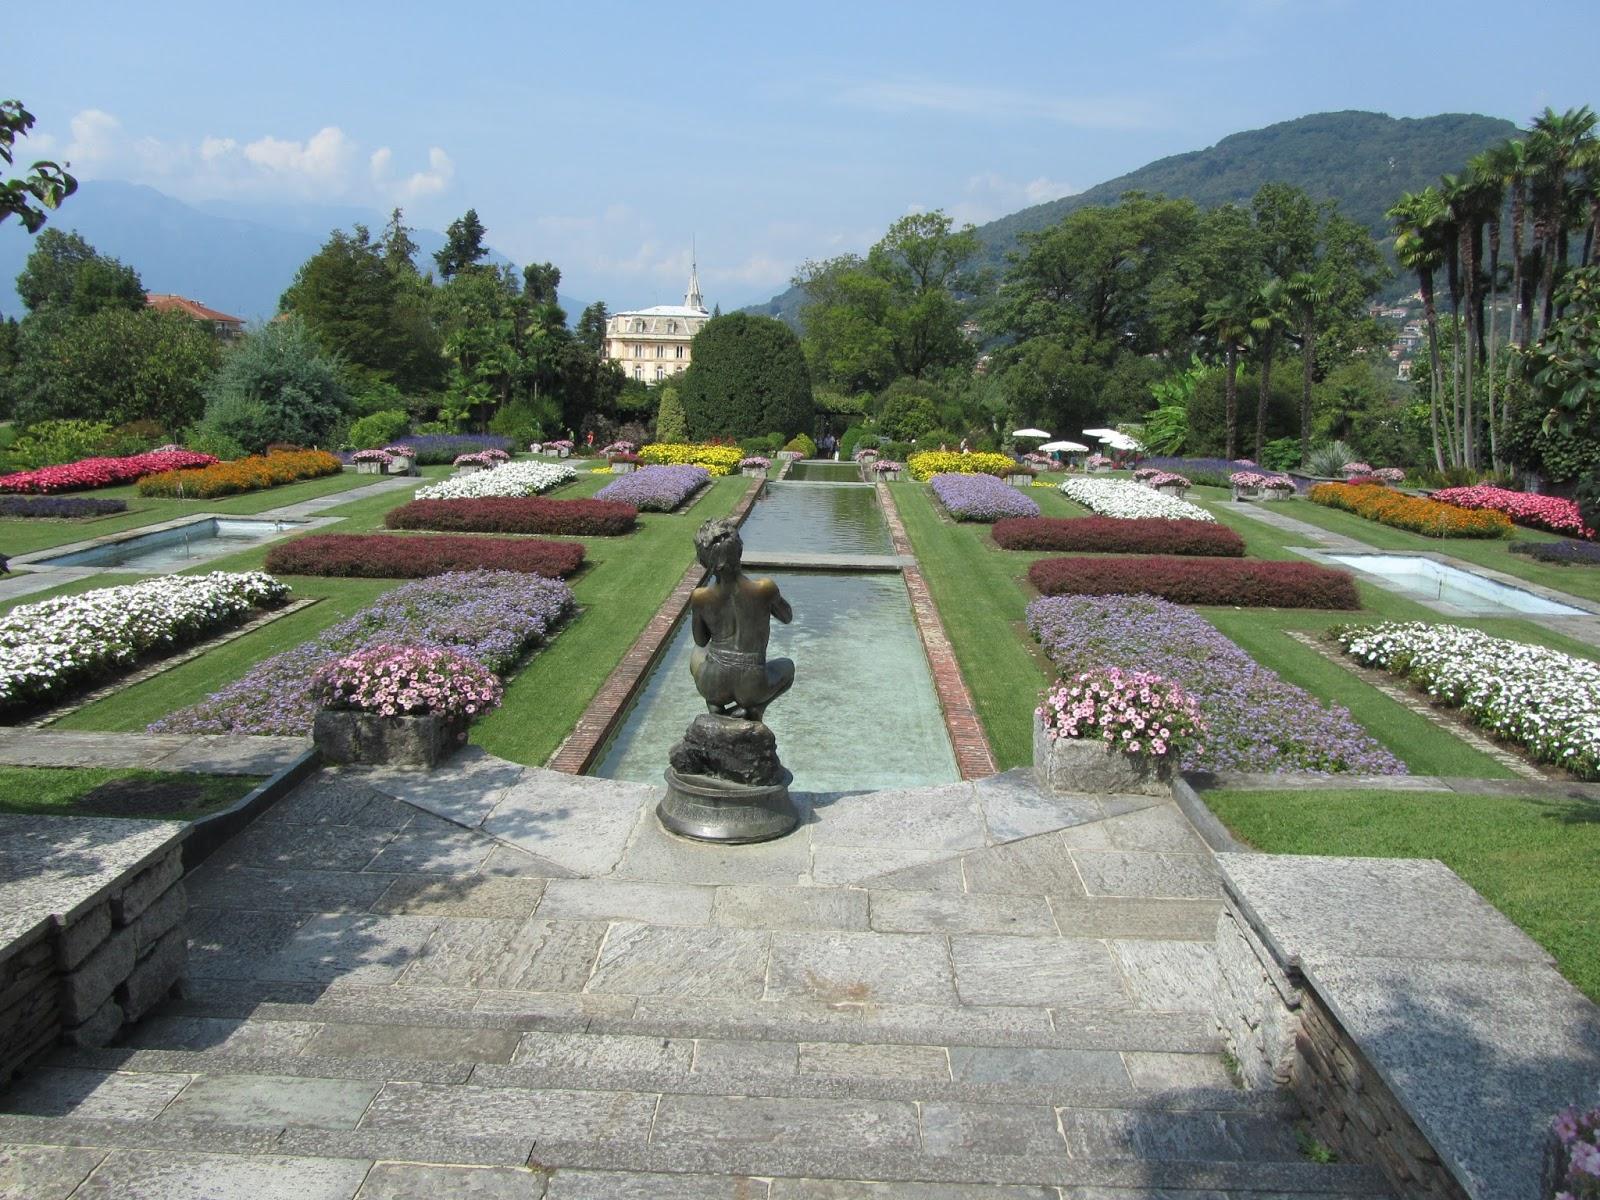 Stunning Giardini Terrazzati Immagini Images - Idee Arredamento Casa ...